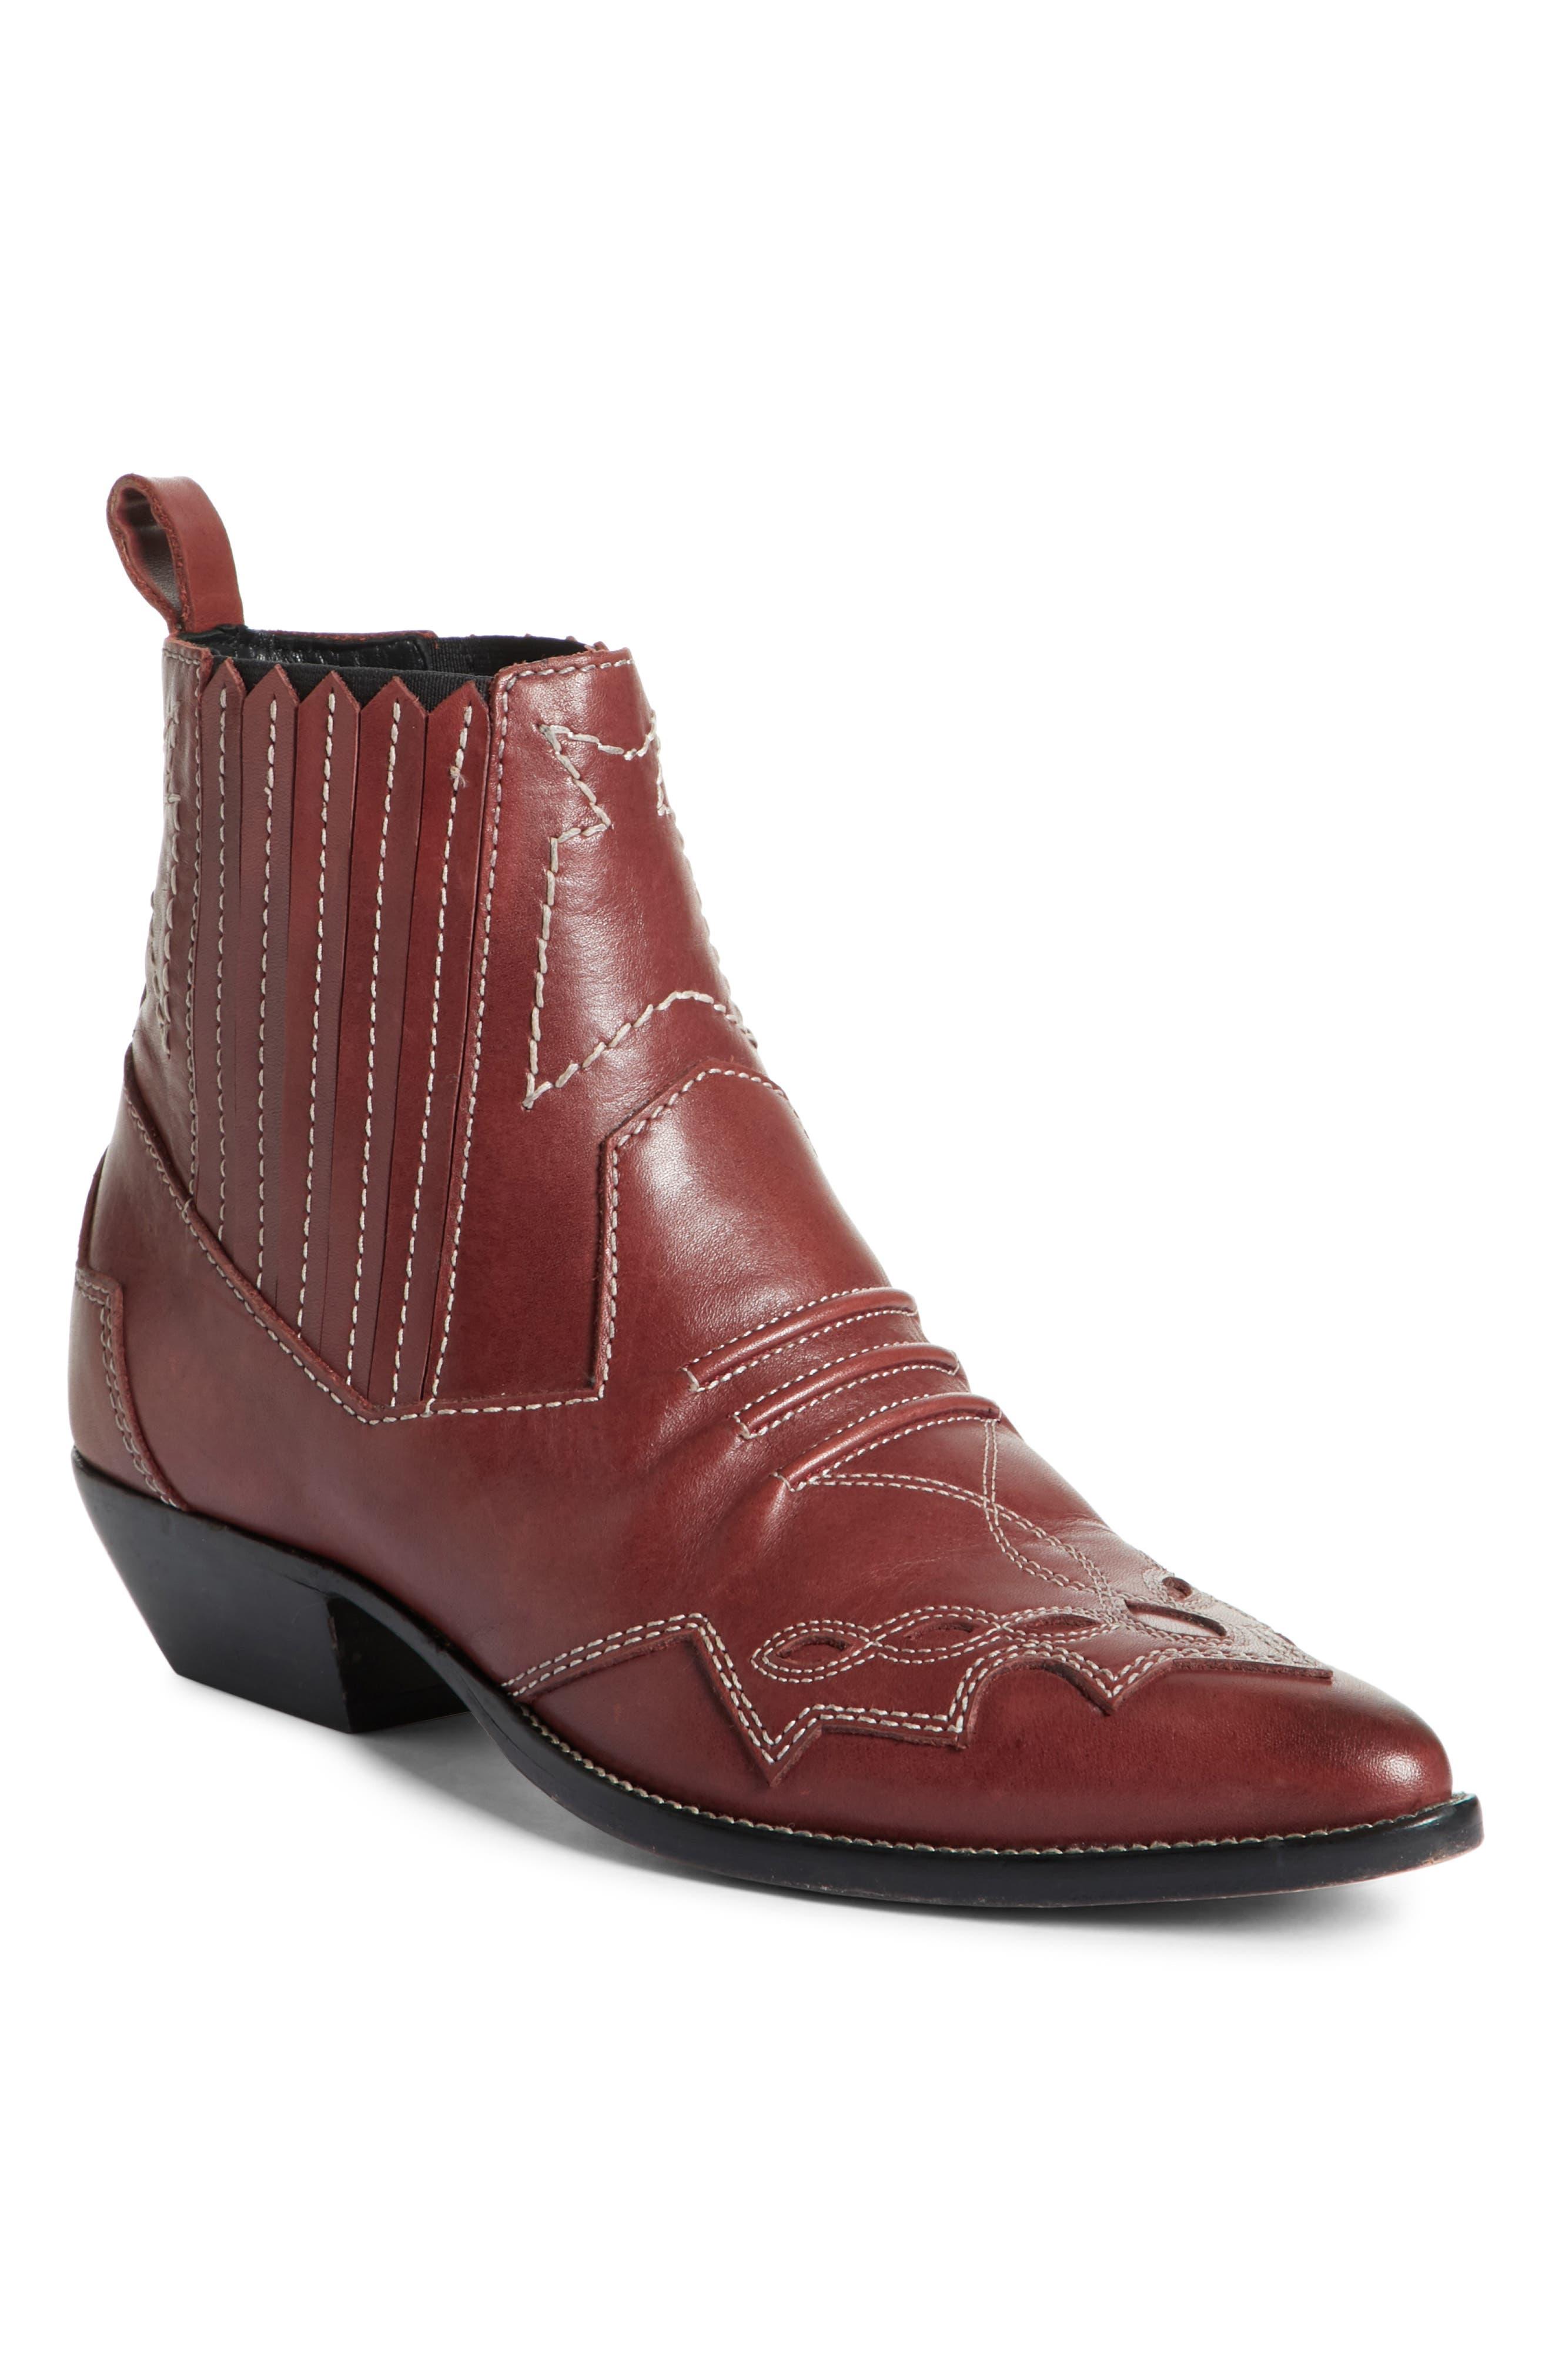 ROSEANNA Tucson Boot in Bordeaux